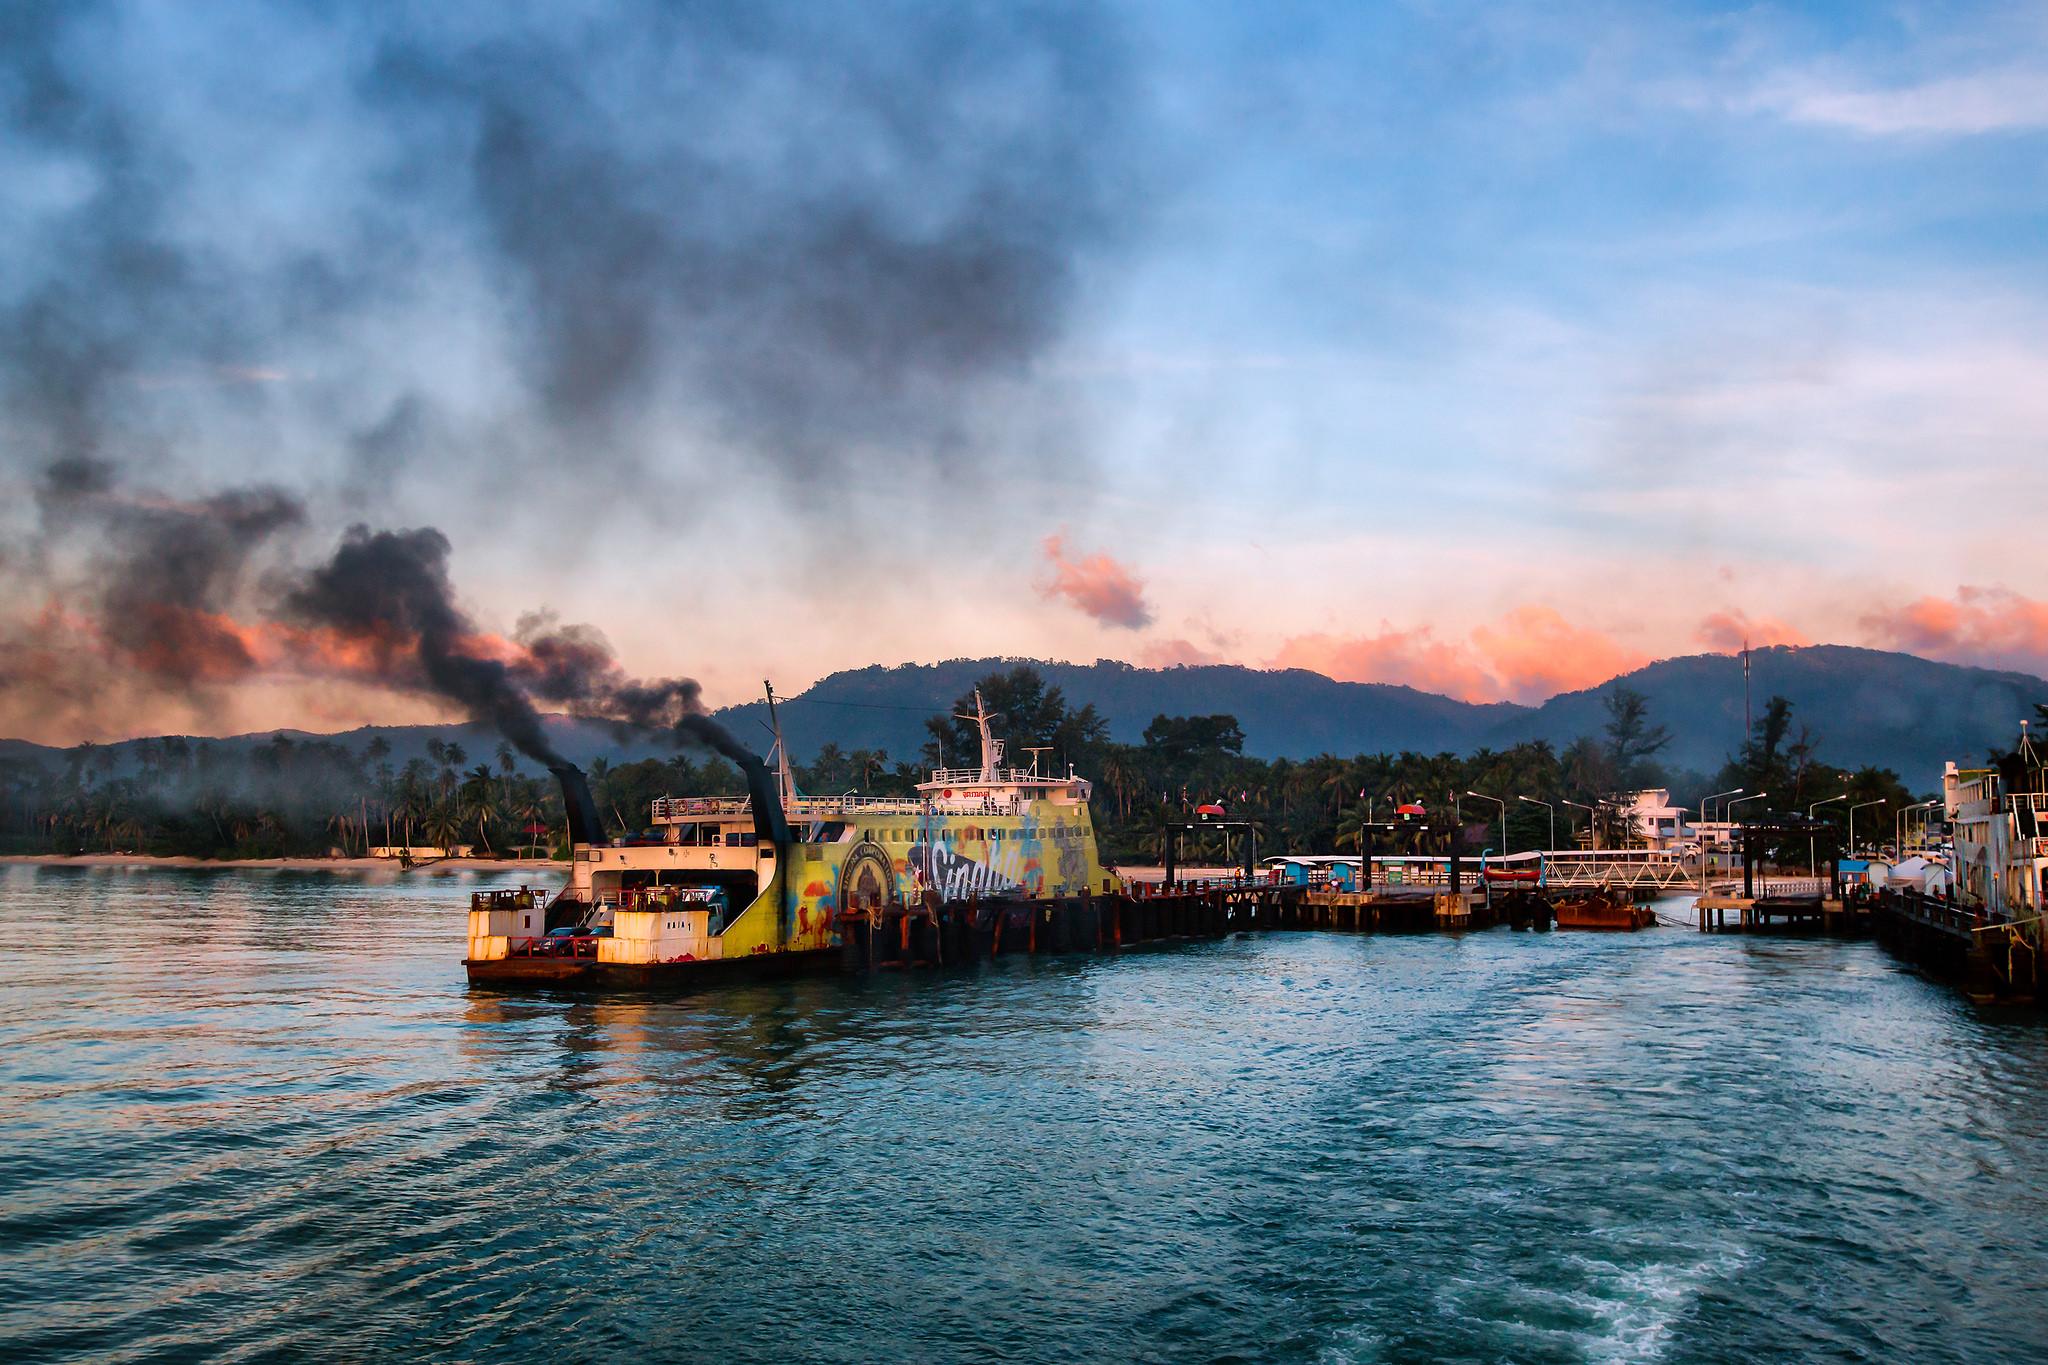 Koh Samui's popular ferry. Image credit:    Jutta M. Jenning   /   Creative Commons